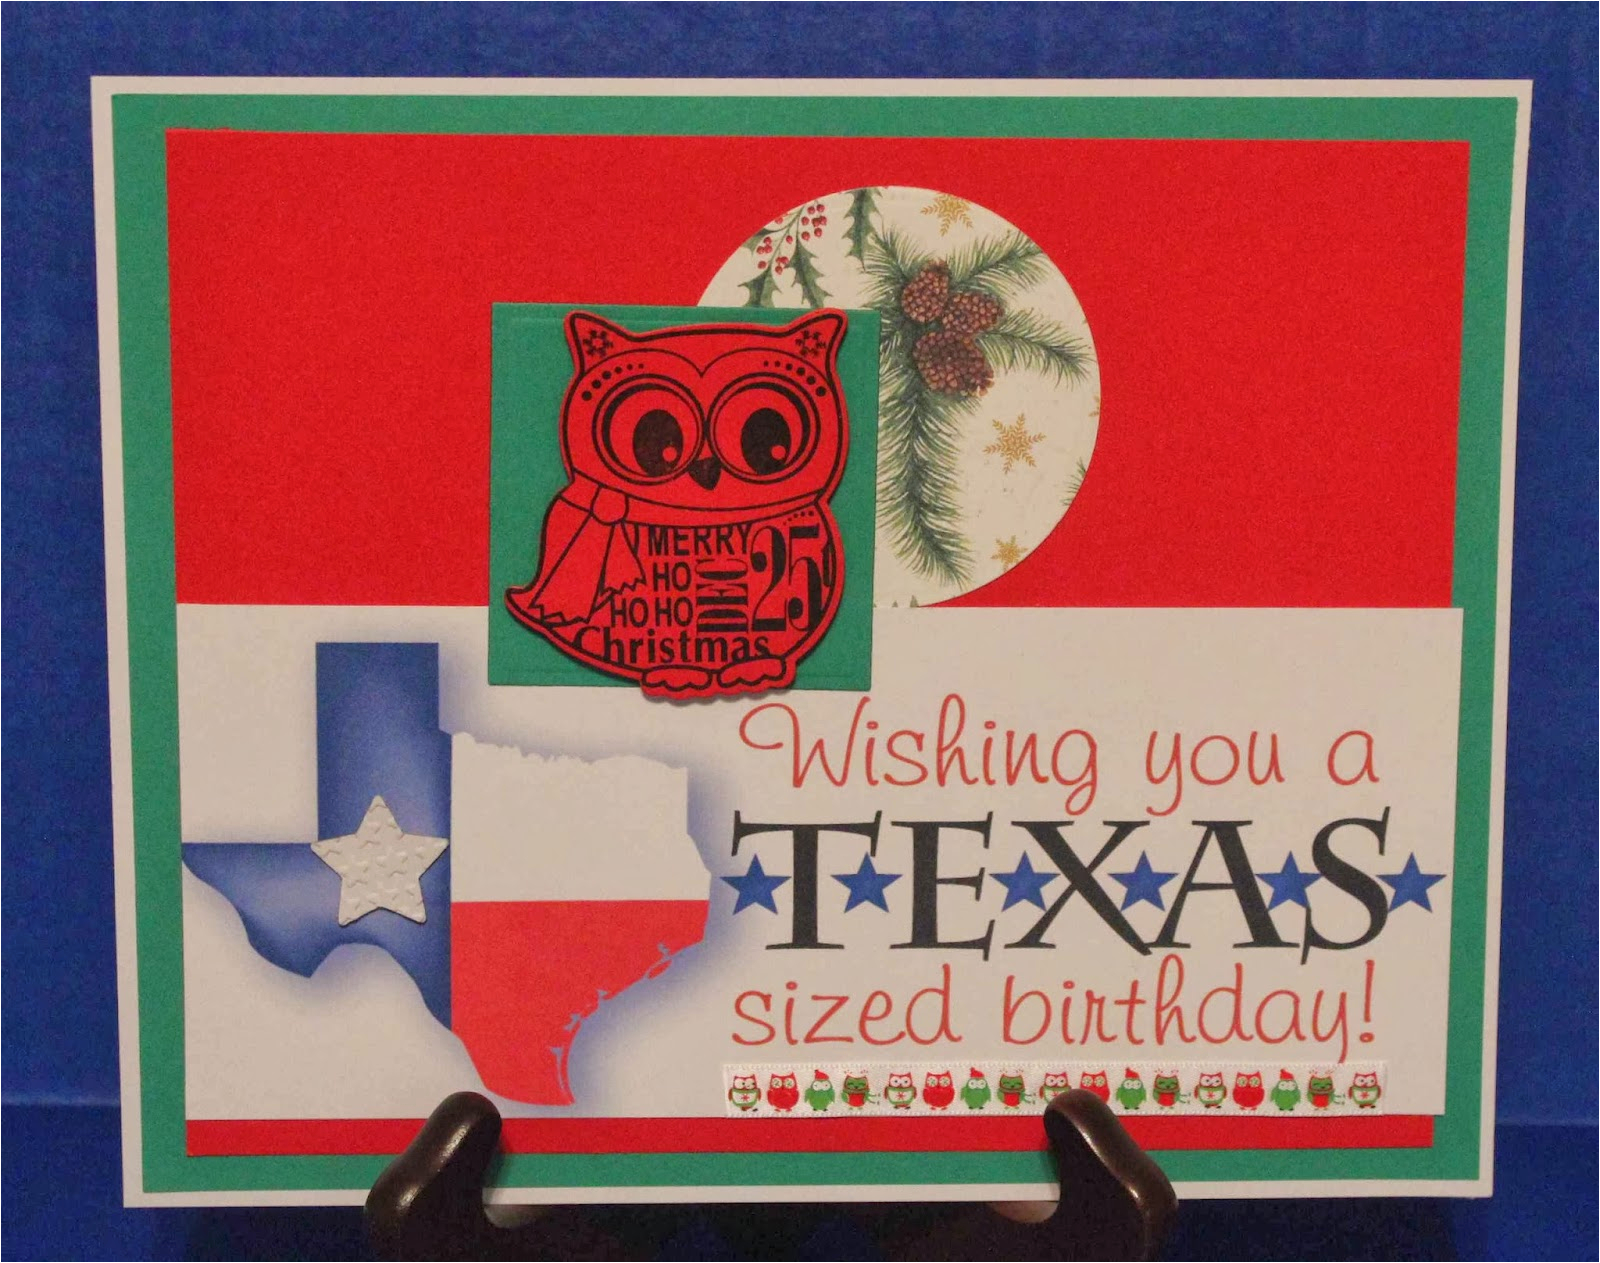 tx sized birthday christmas card